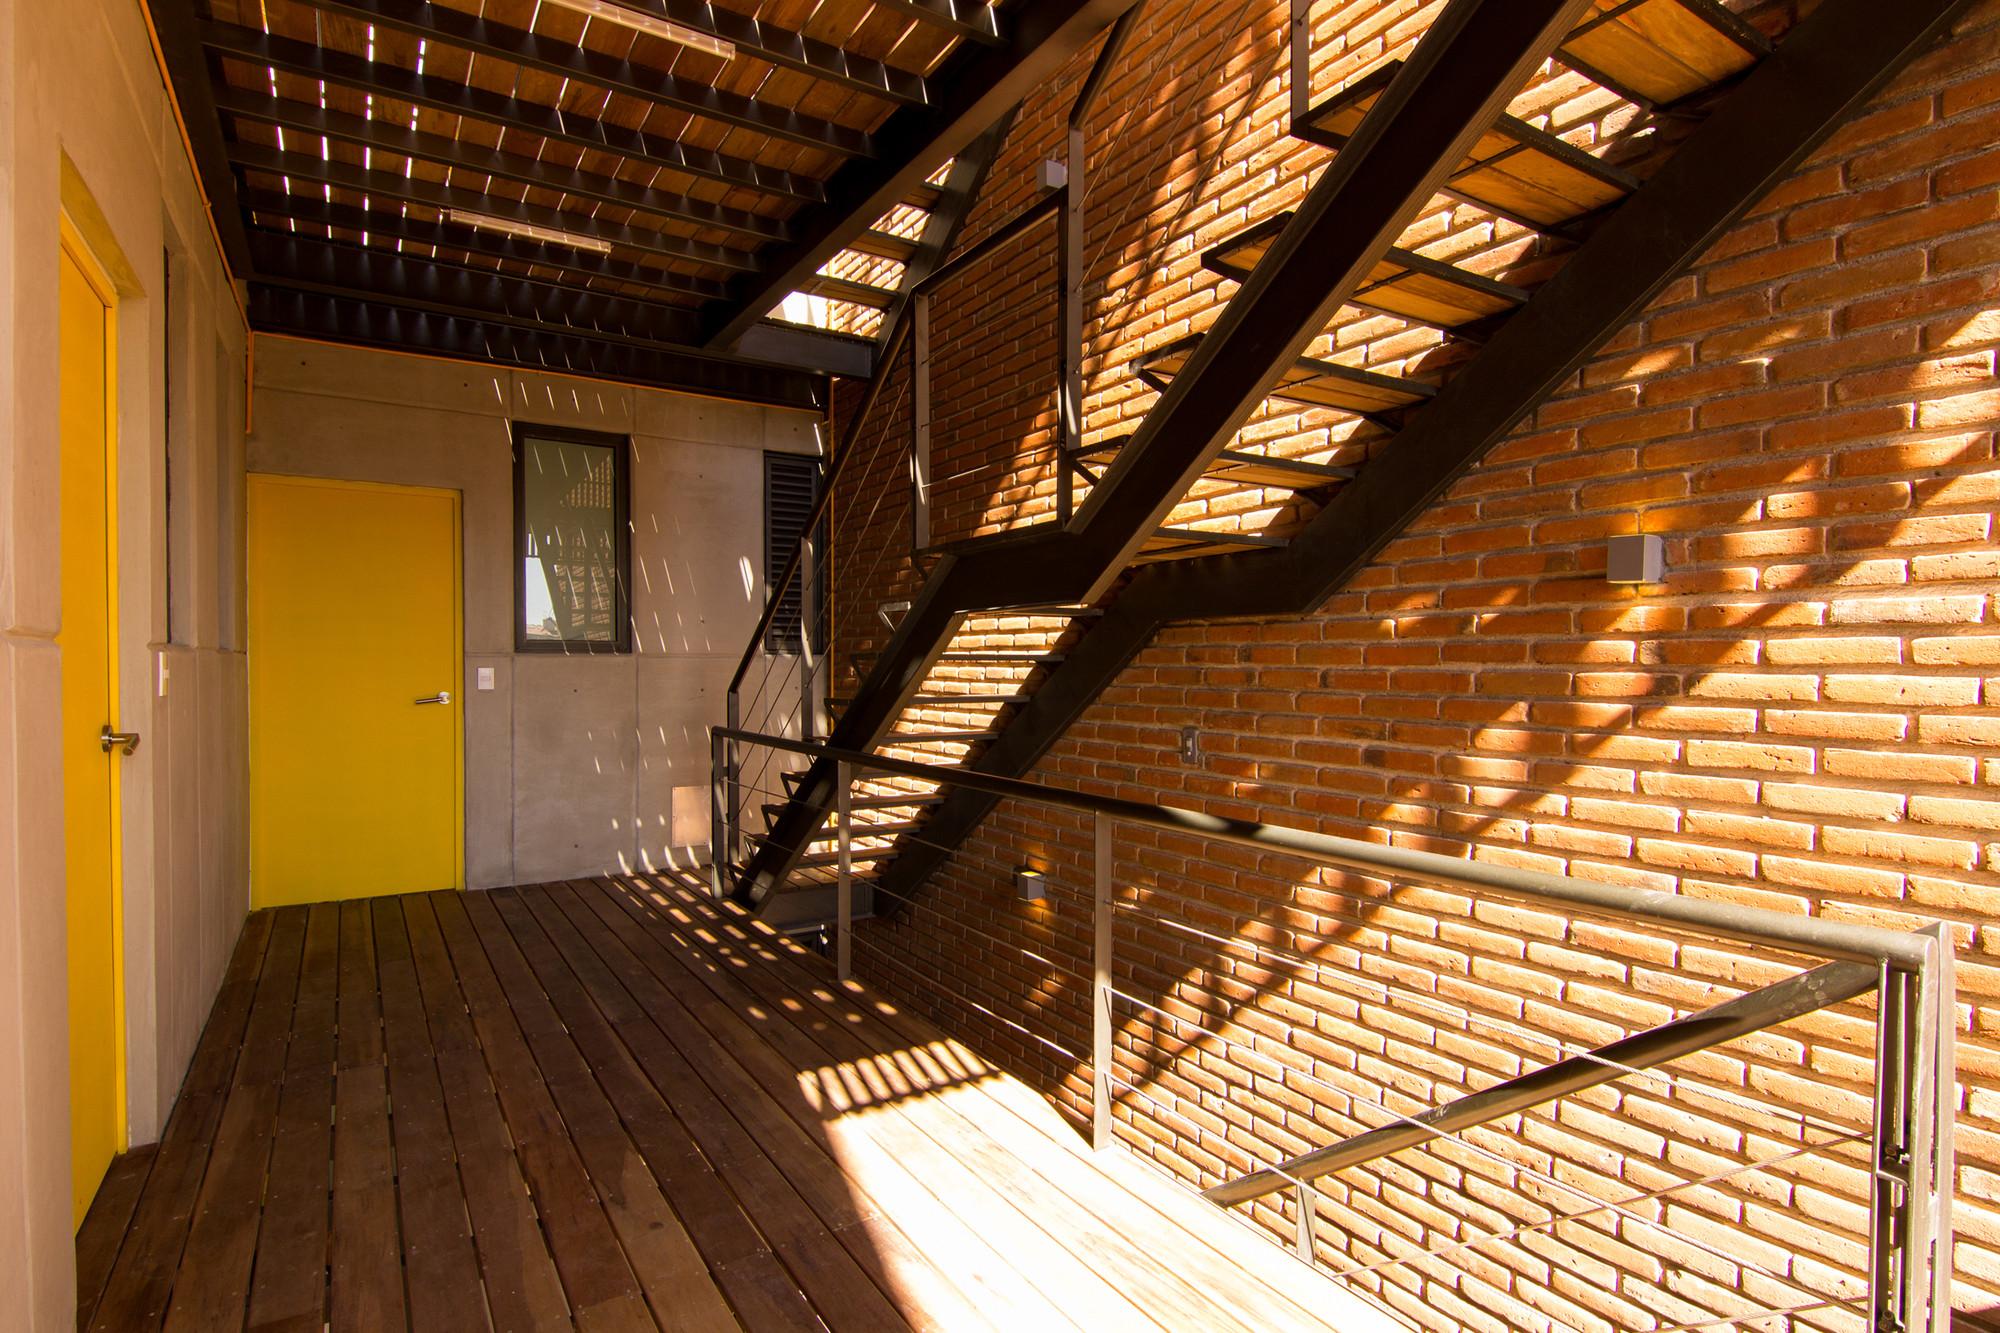 Galeria de bosques flats hgr arquitectos 24 for Couchtisch 1 00 x 1 00